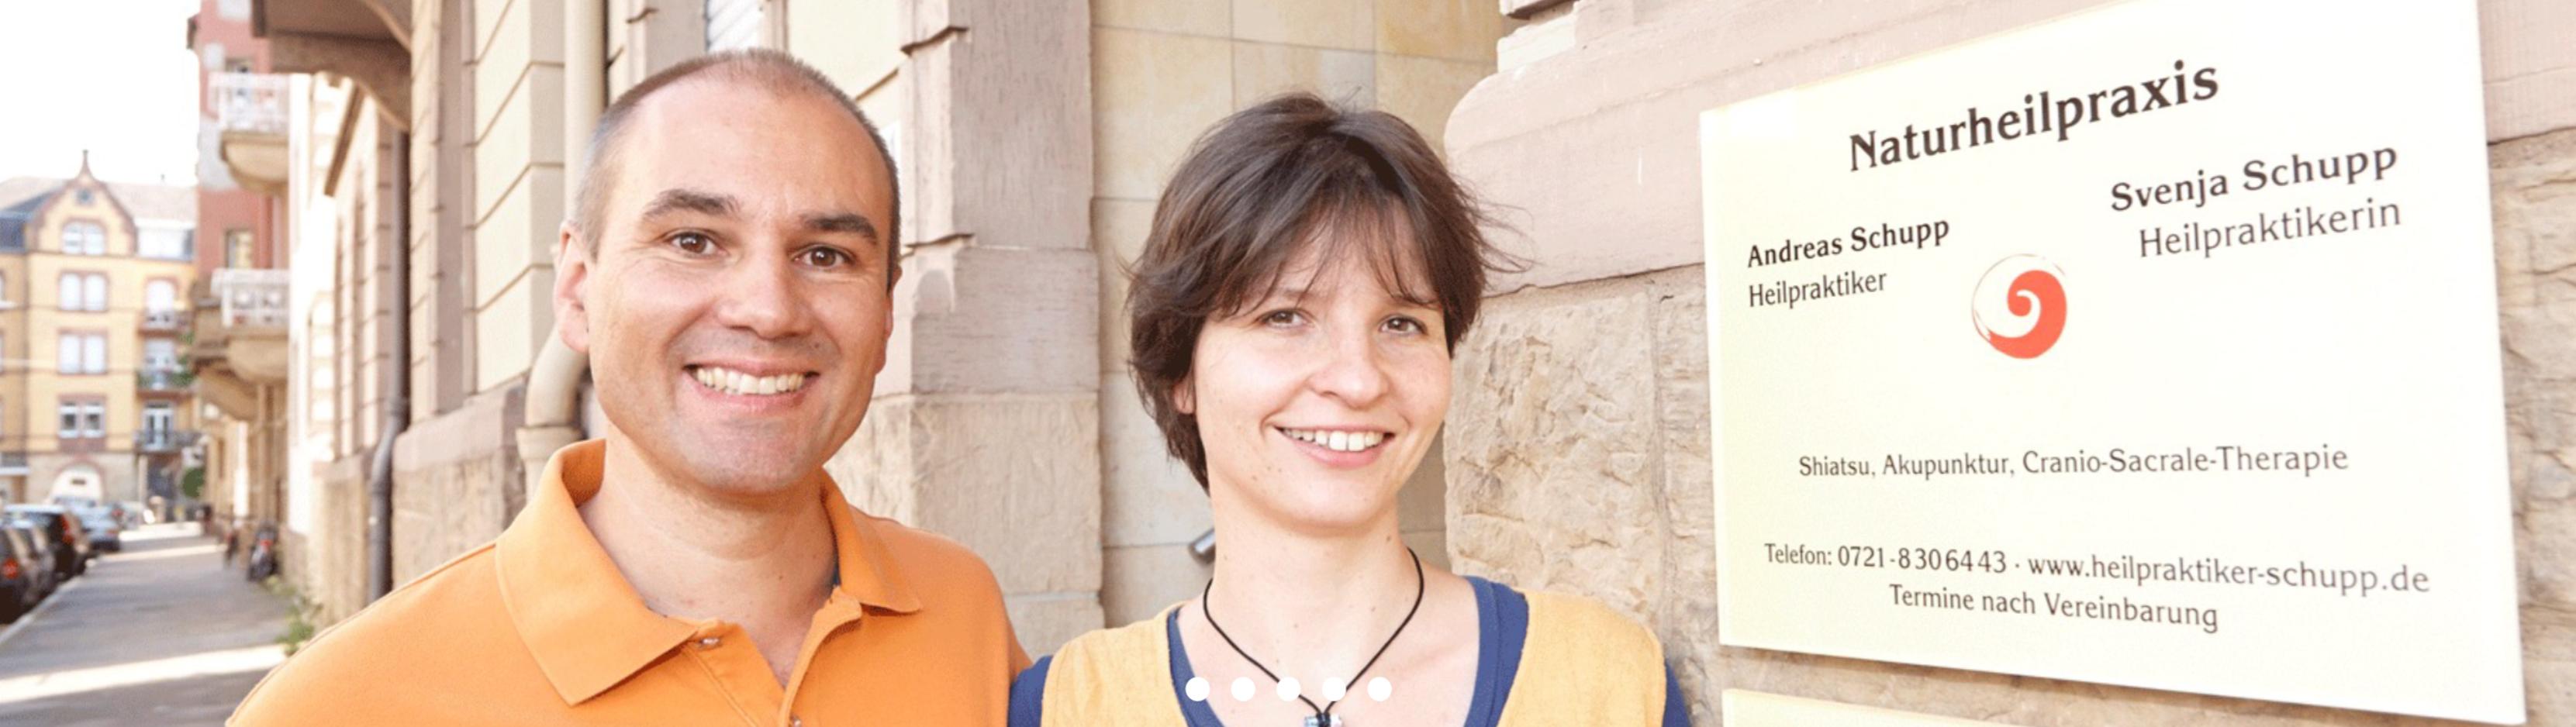 Svenja und Andreas Schupp